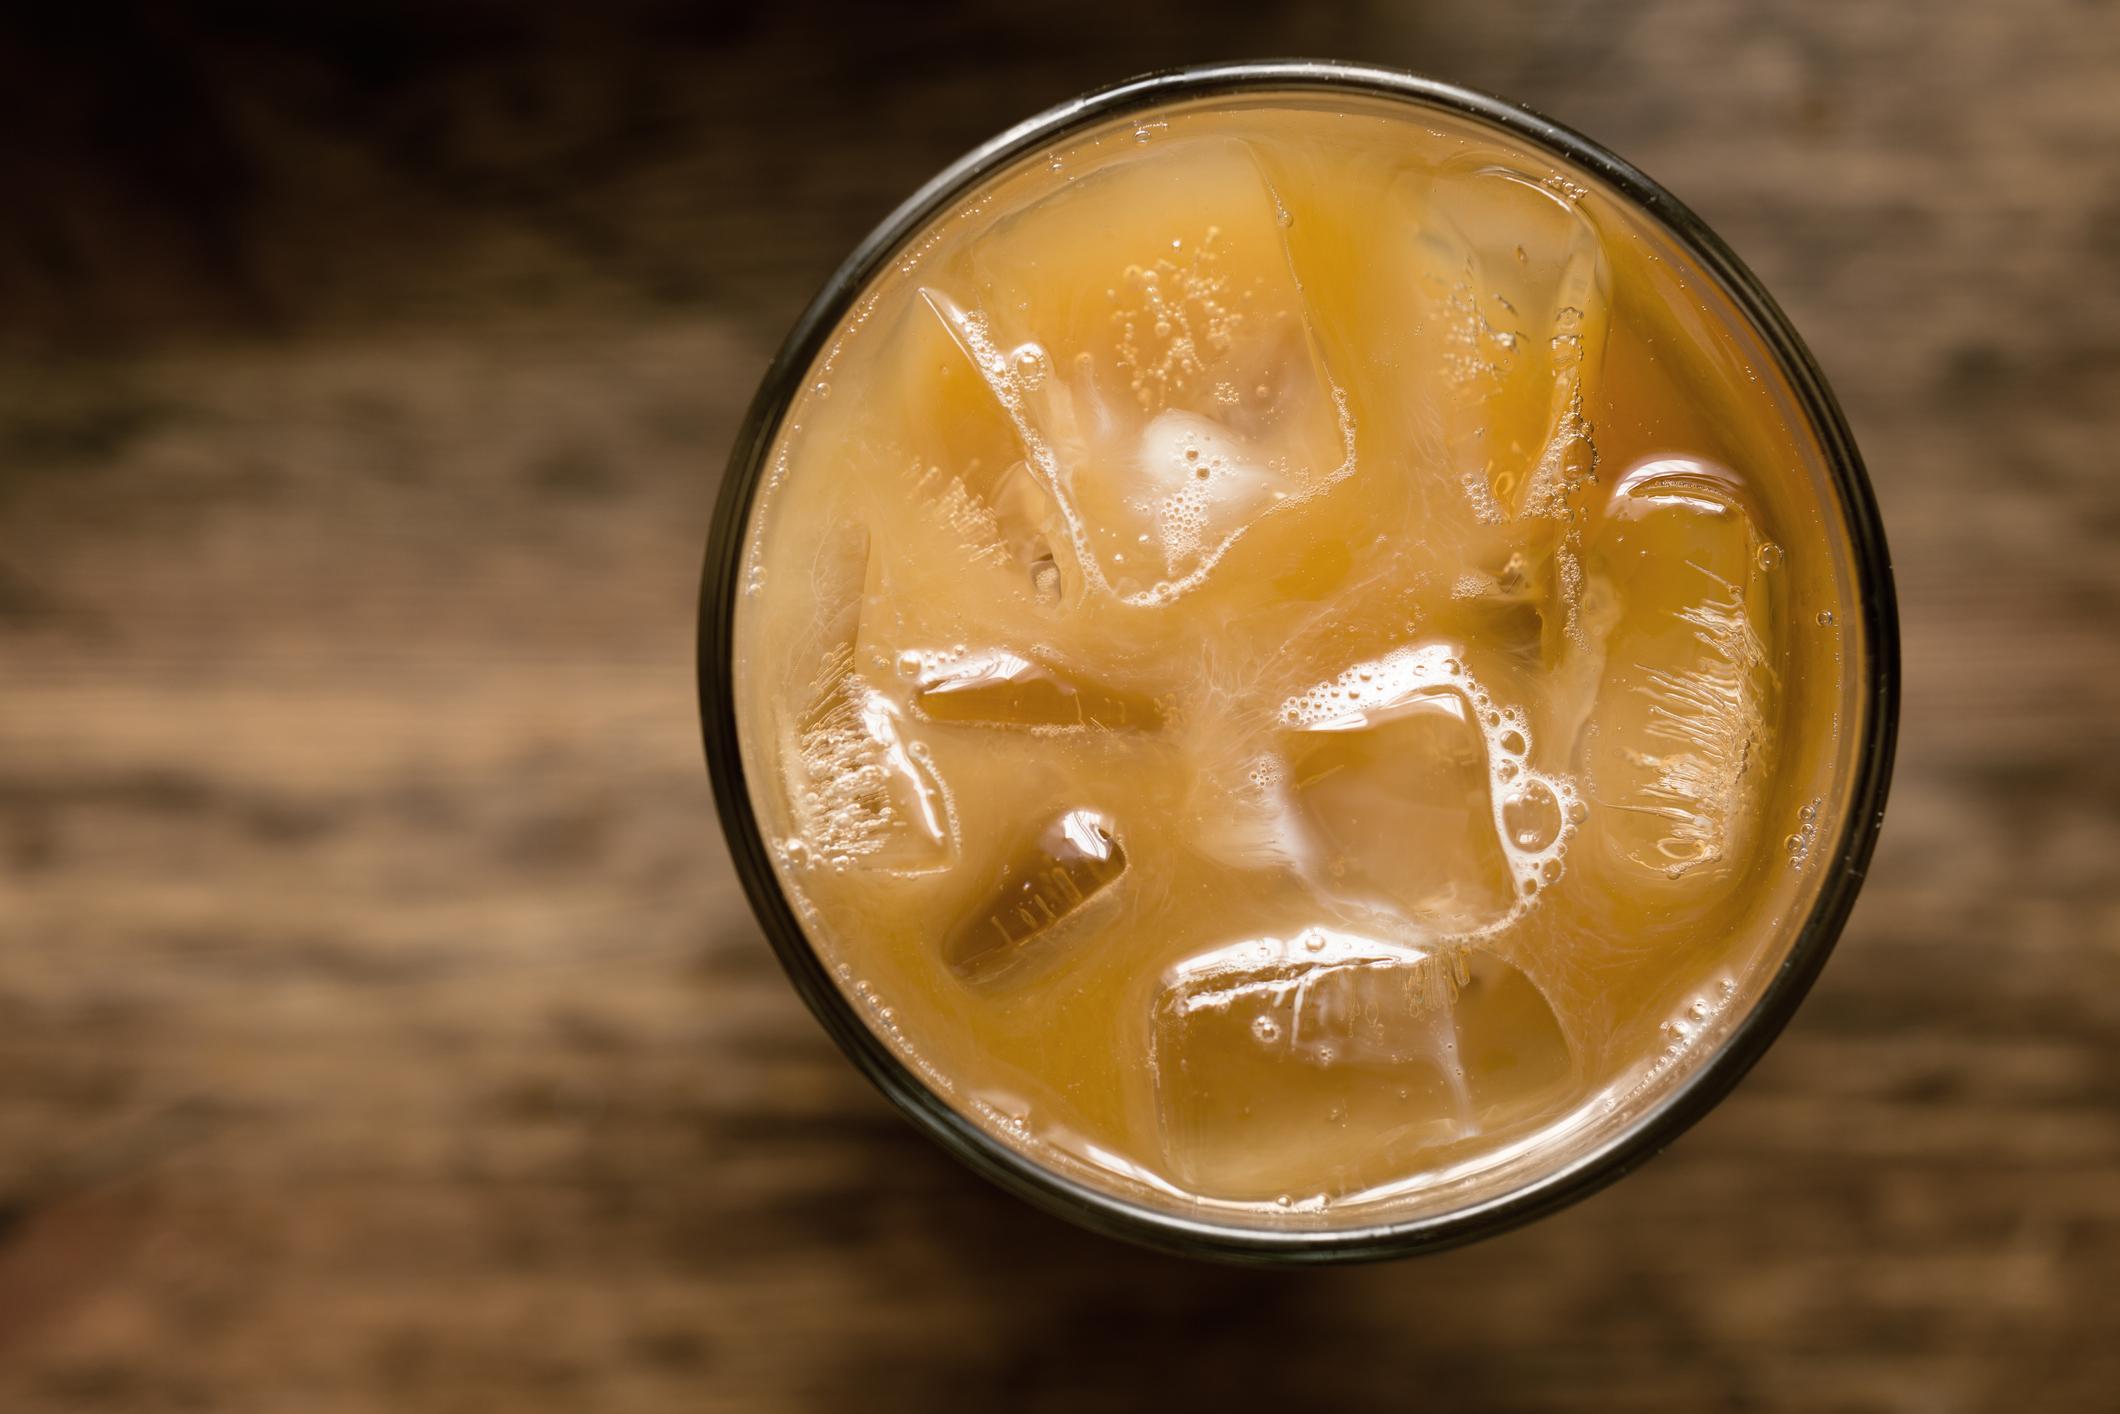 Cold Drinks - *organicCafe' *LemonaideCafe' Wildberry Herbal Iced Tea*Apple JuiceIced *ChaiIced *Americano or *ExpressoIced Latte*All *Milks